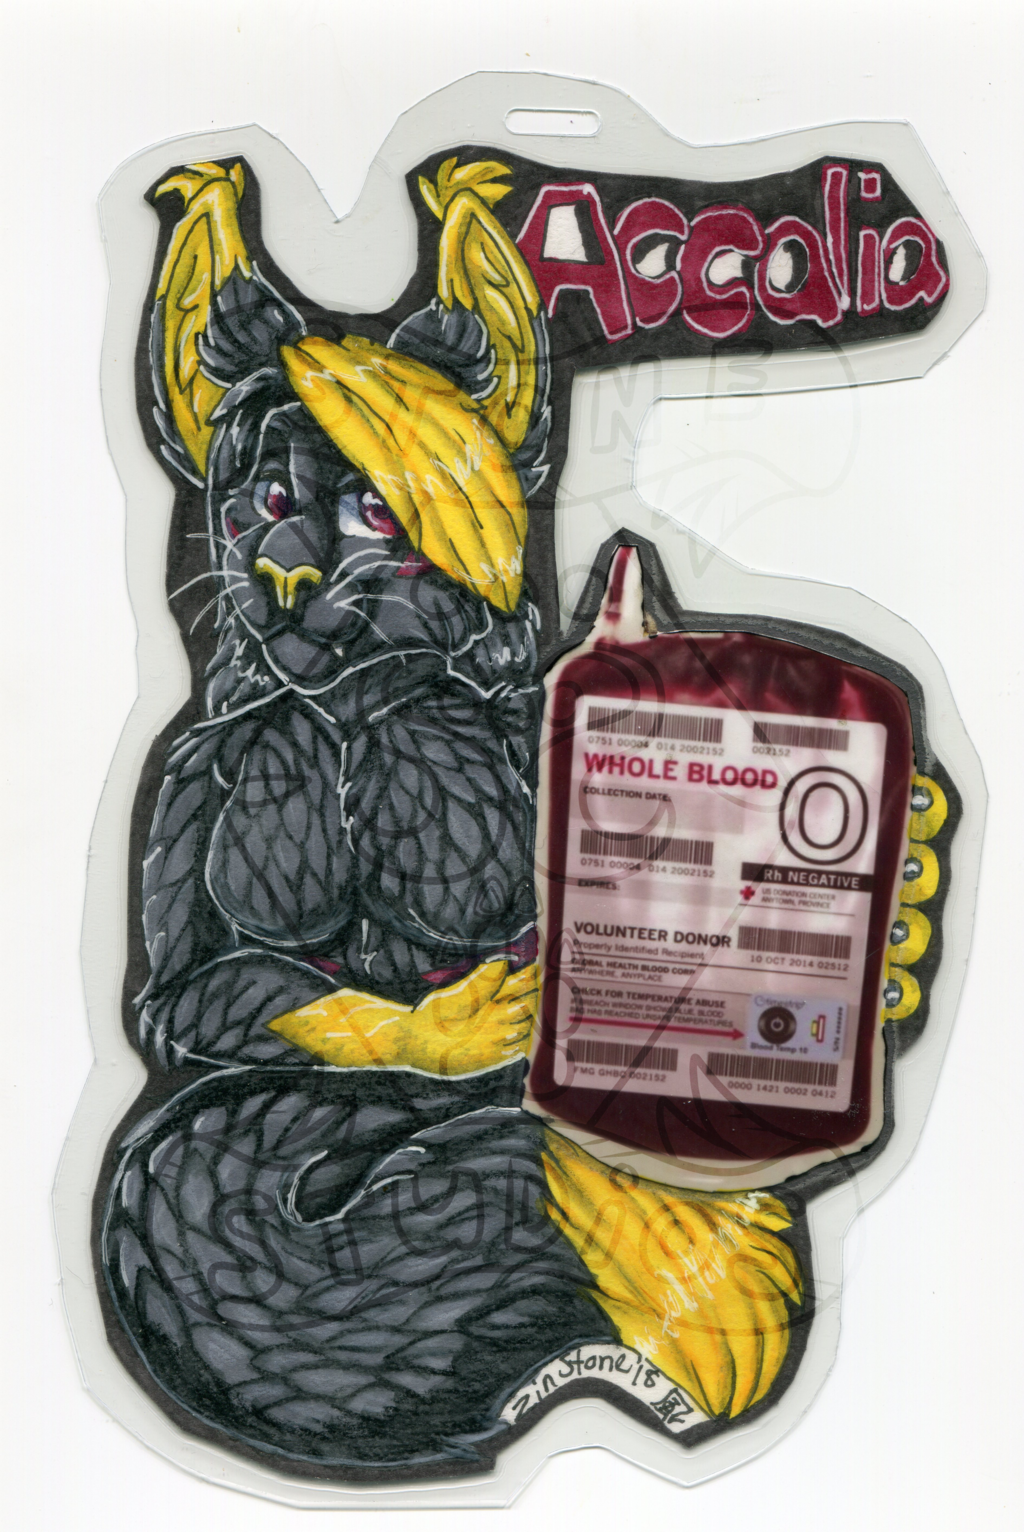 Accalia Drink Badge - AC2018